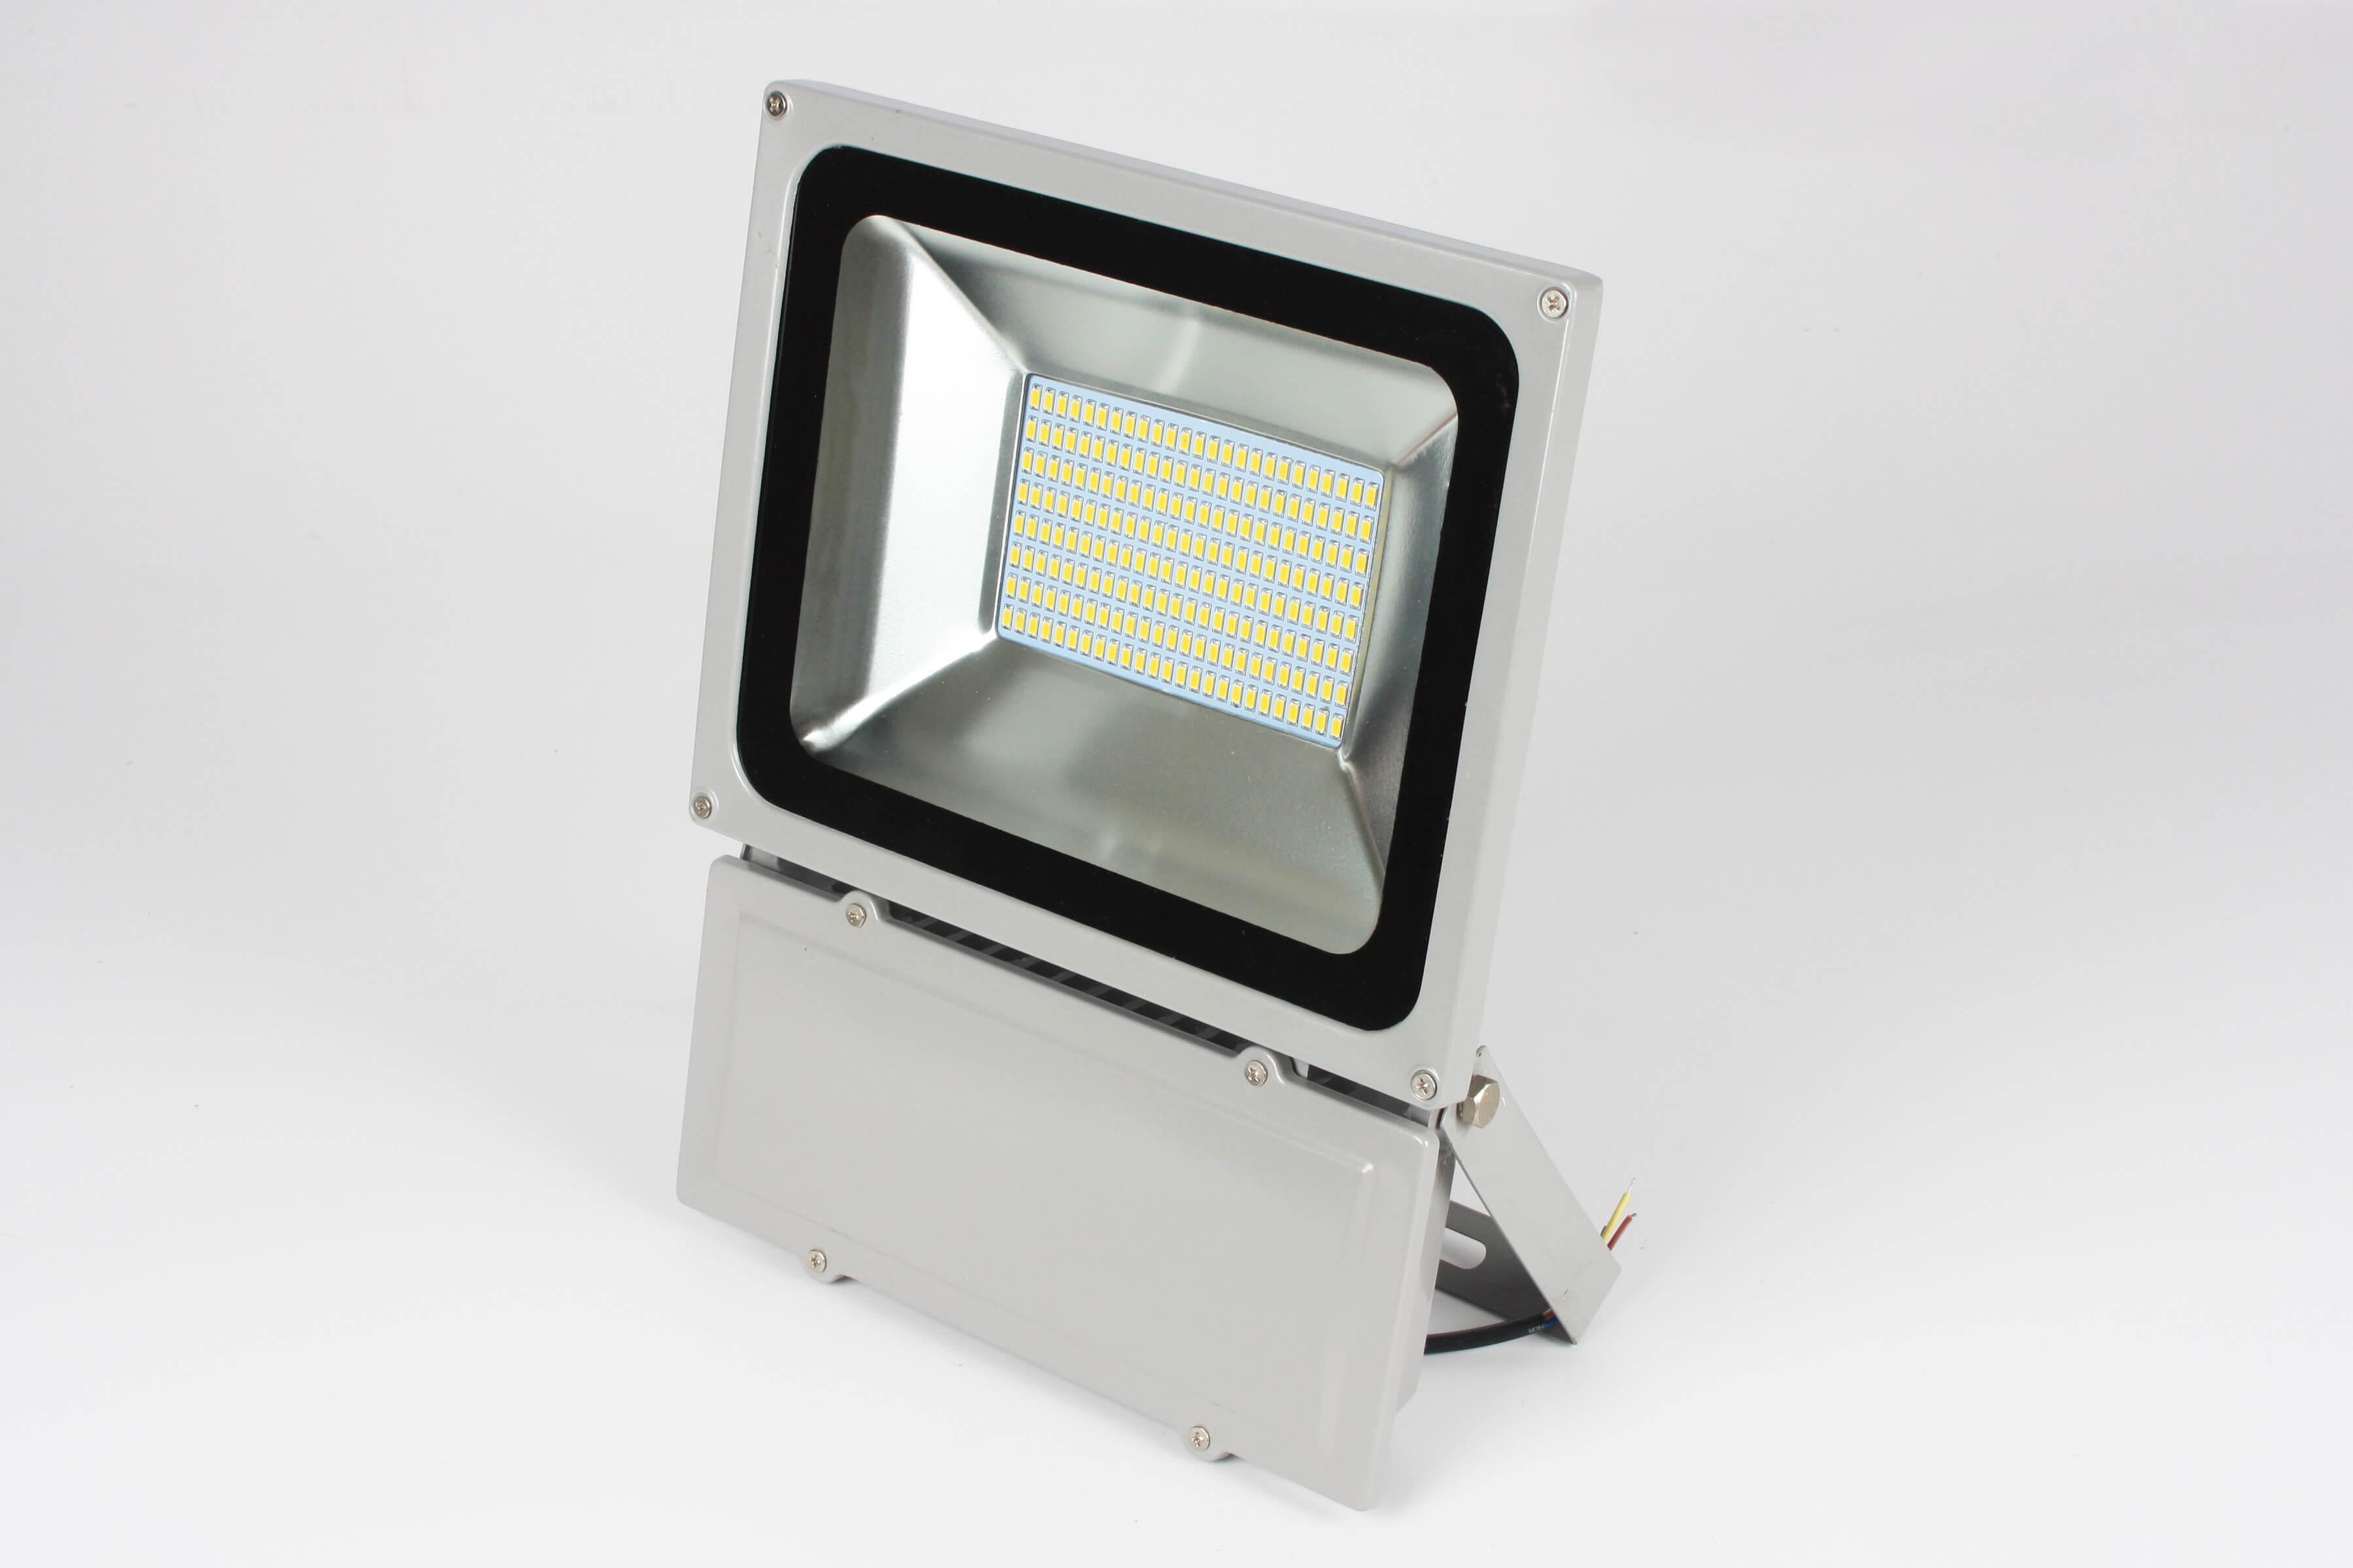 Plafoniere Da Esterno Ip 65 : Flood light proiettori da esterno ip lampade e plafoniere a